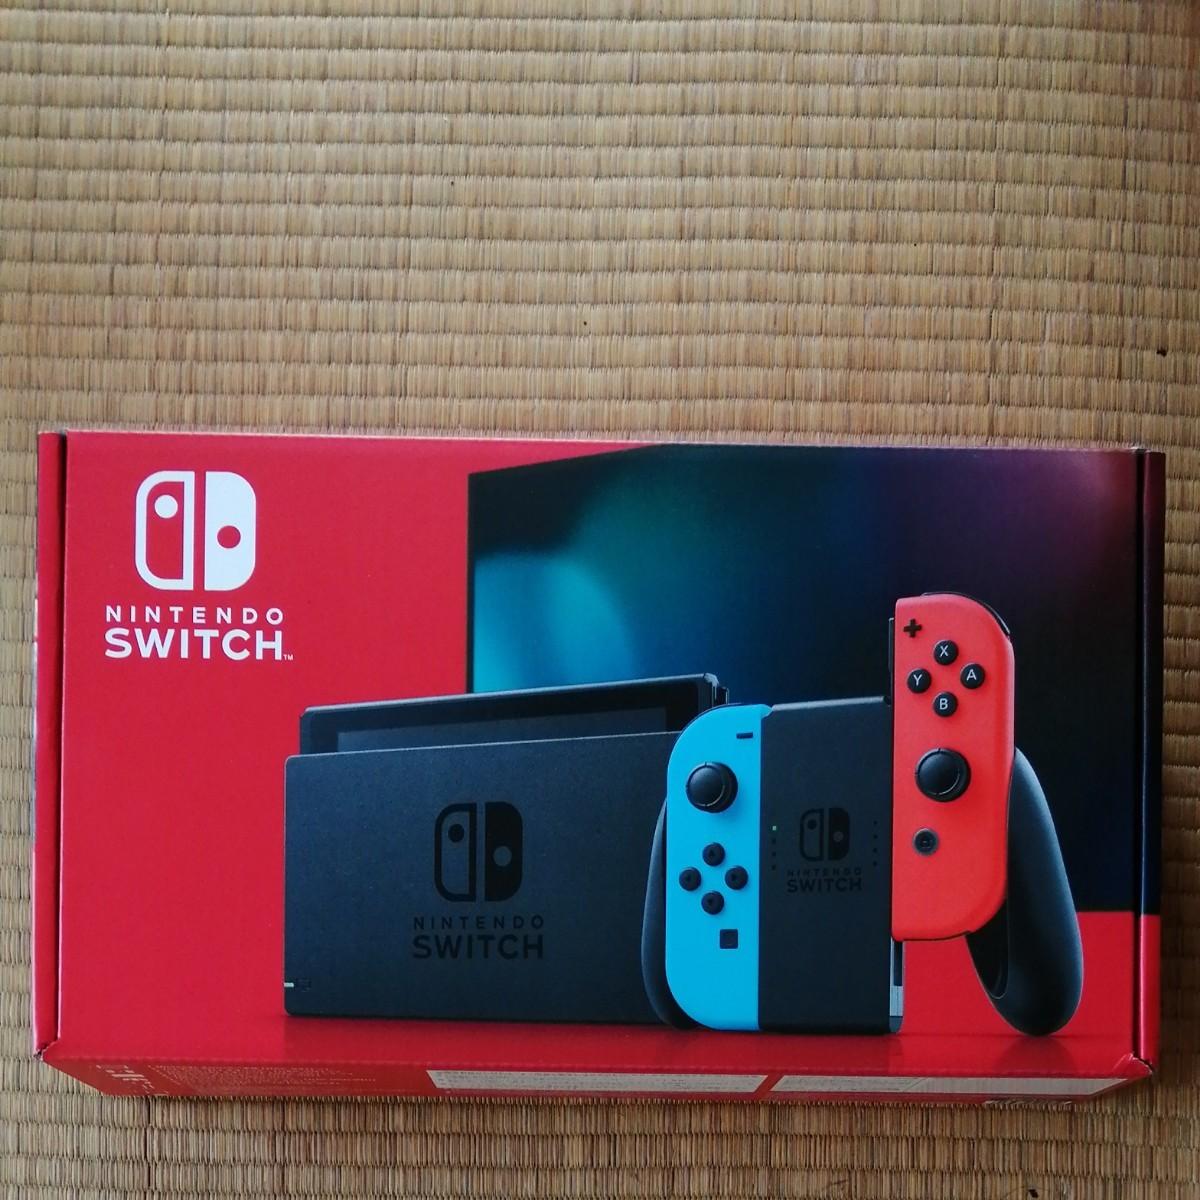 Nintendo Switch ニンテンドースイッチ本体 ネオンブルー ネオンレッド 新品